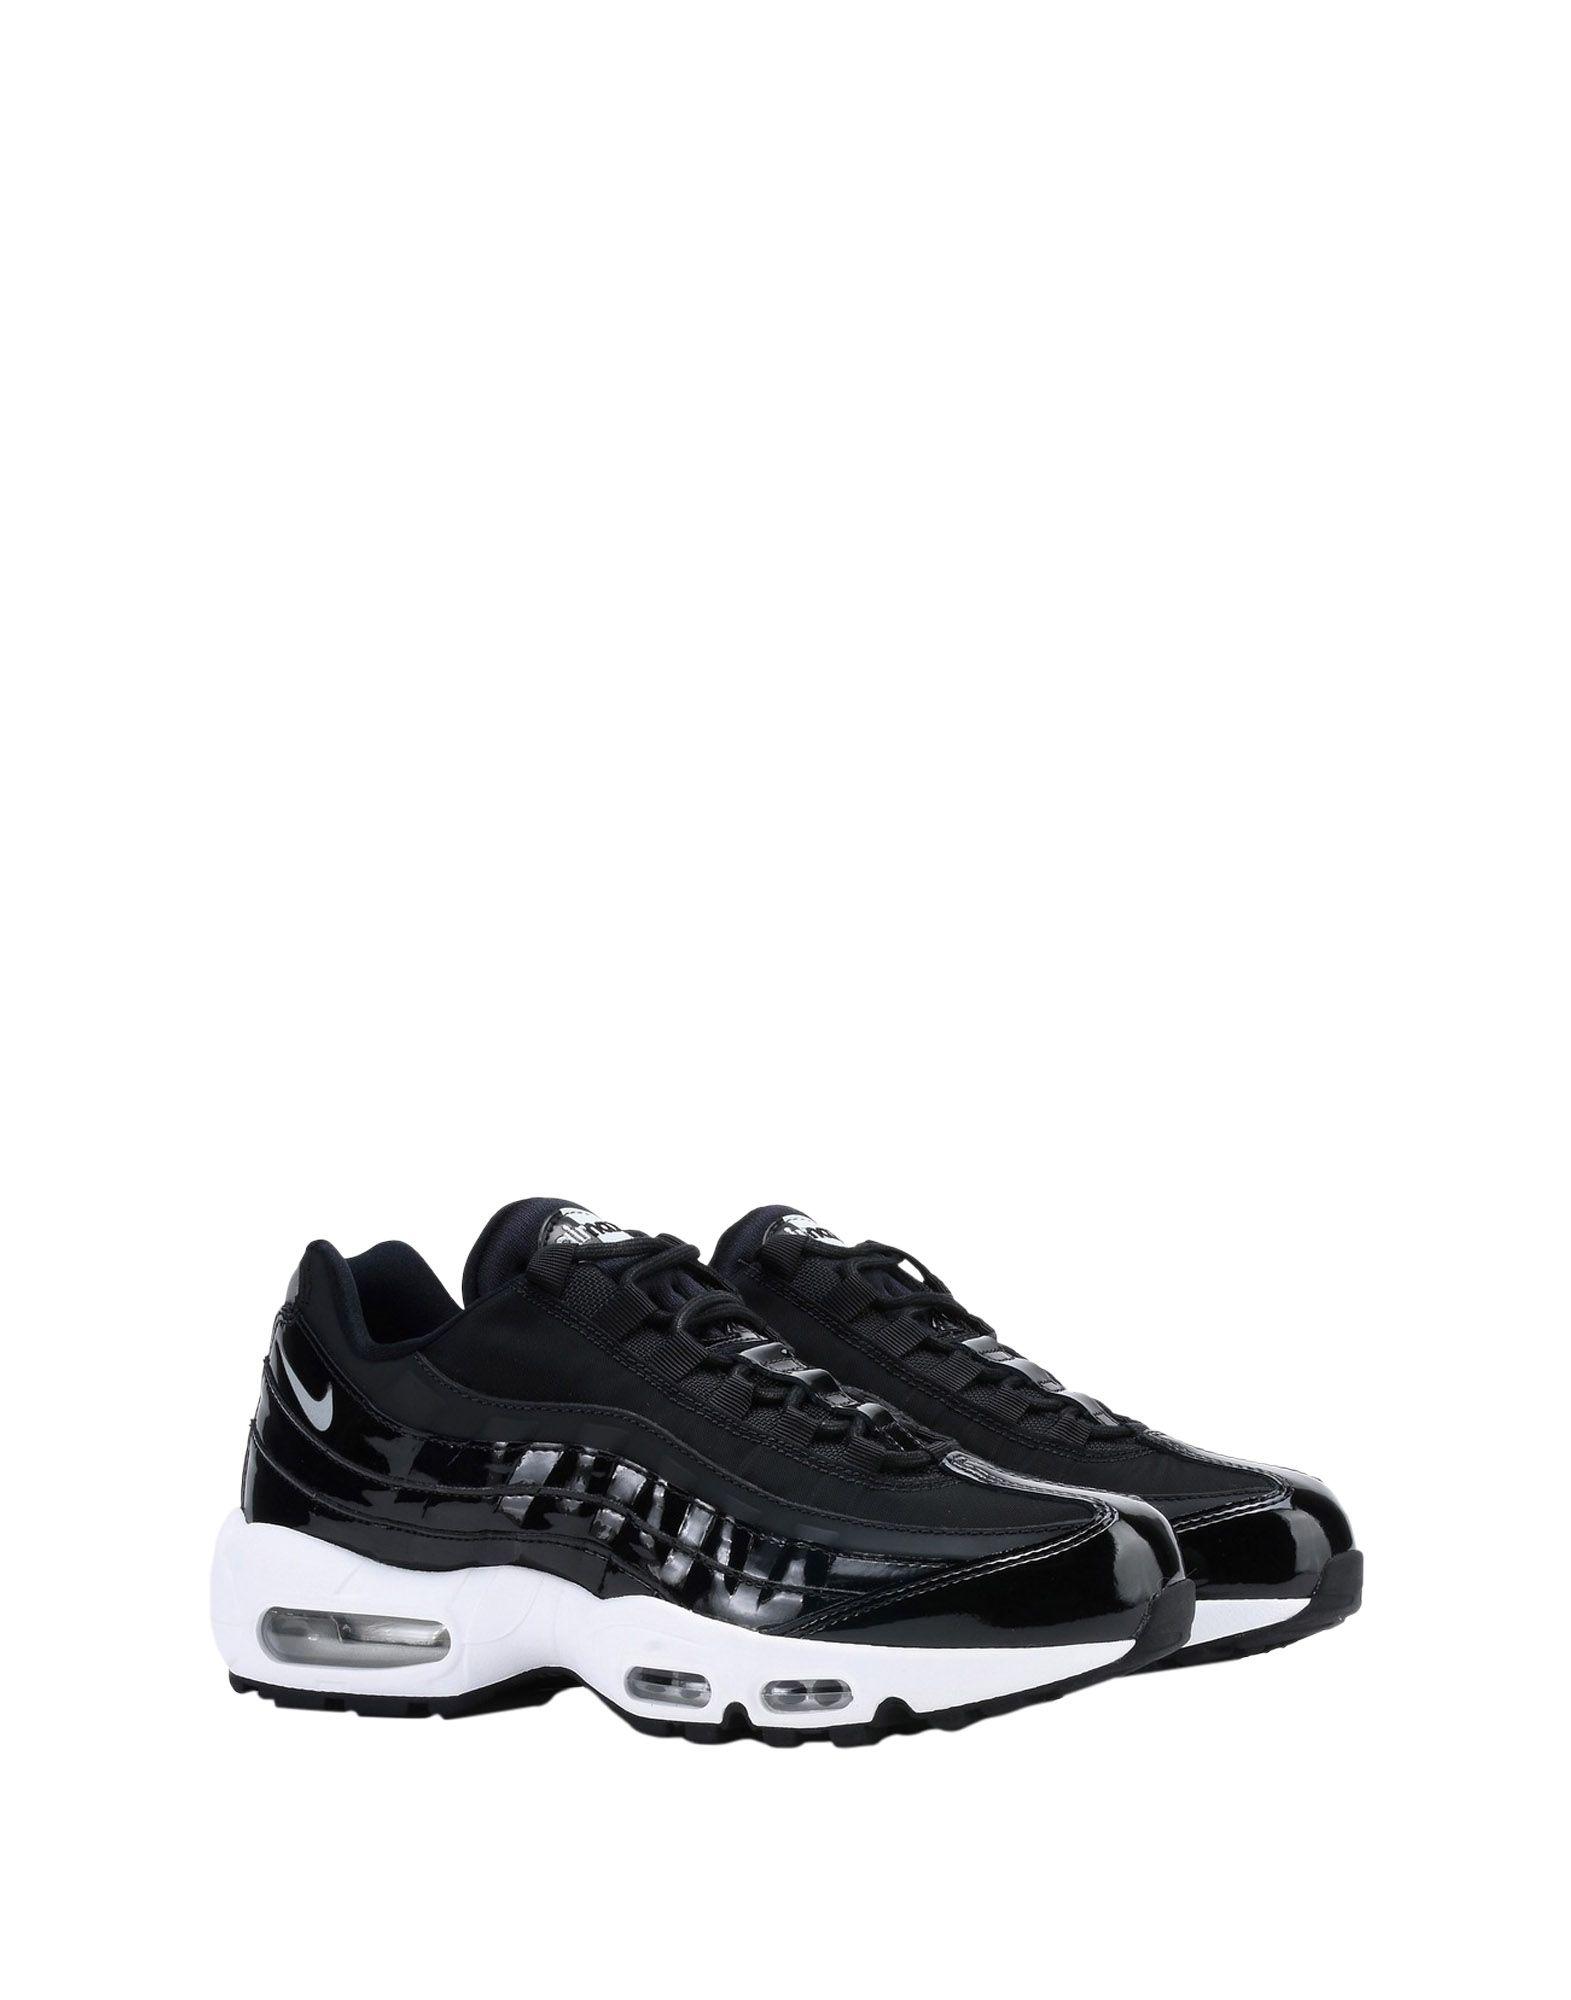 617b24327a856 ... Sneakers Nike Wmns Air Max 95 Se Prm - Femme - Sneakers Nike sur